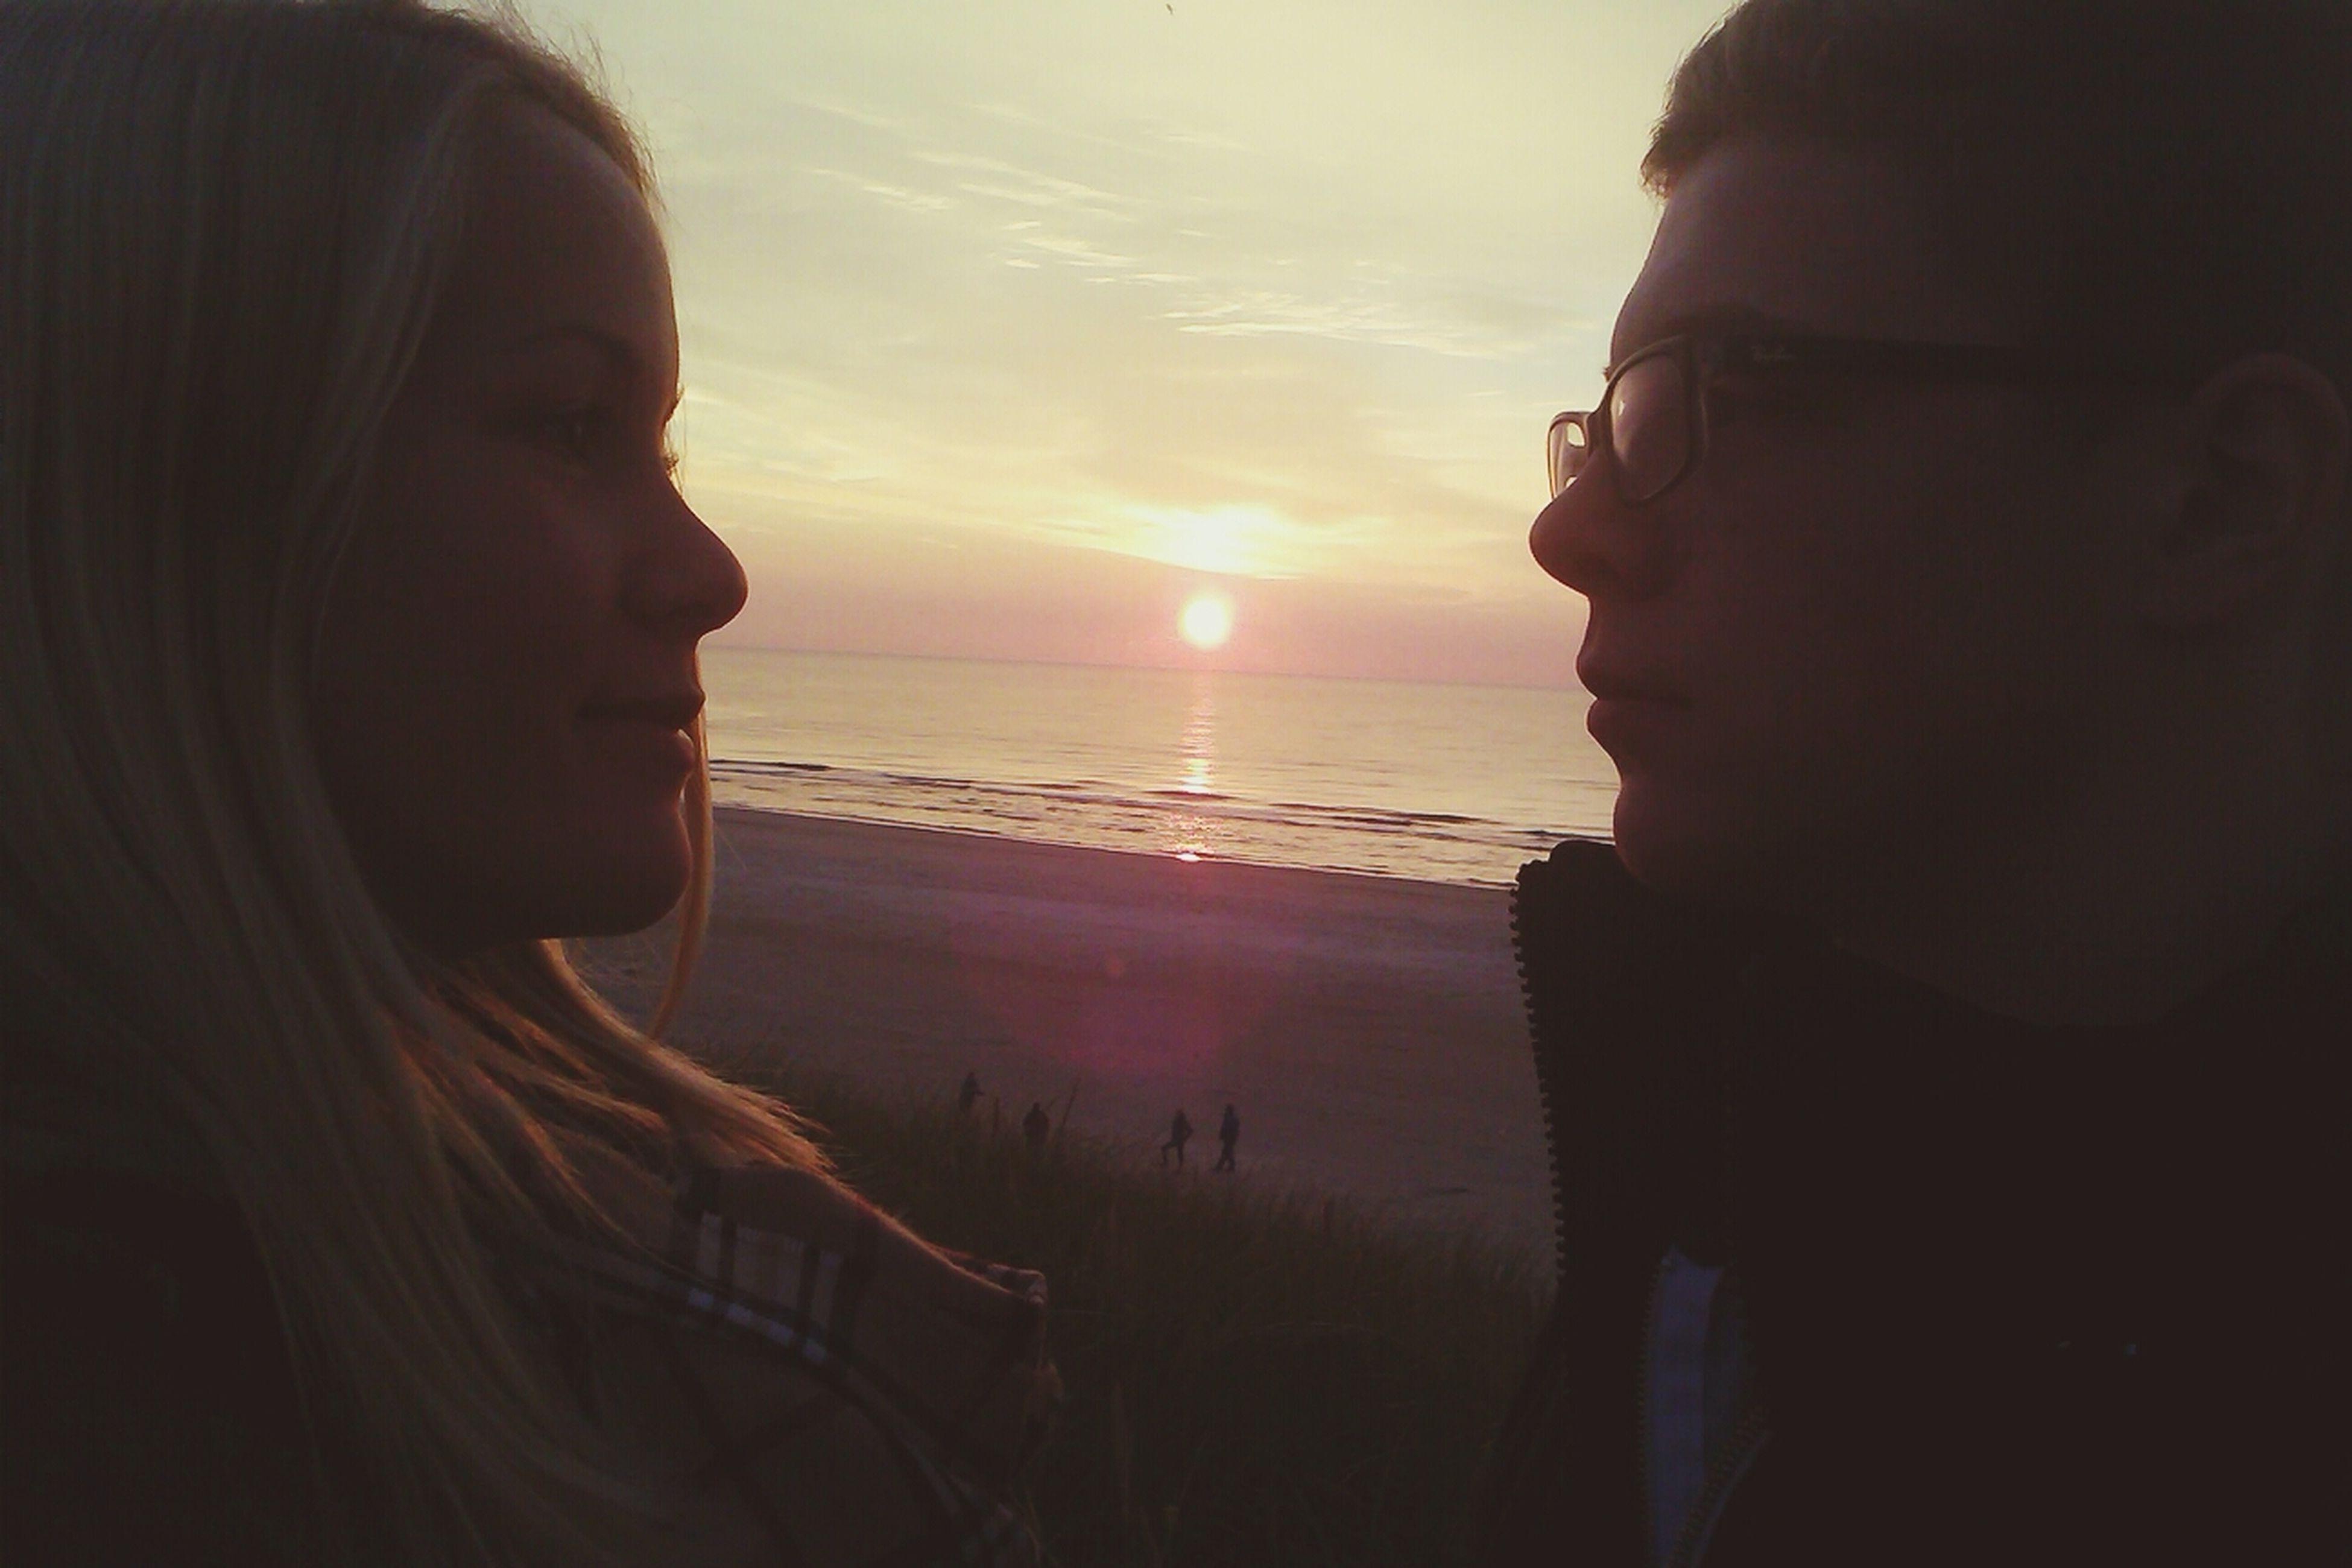 sea, horizon over water, sun, sunset, water, beach, sky, scenics, sunlight, beauty in nature, lifestyles, headshot, leisure activity, tranquil scene, tranquility, shore, nature, vacations